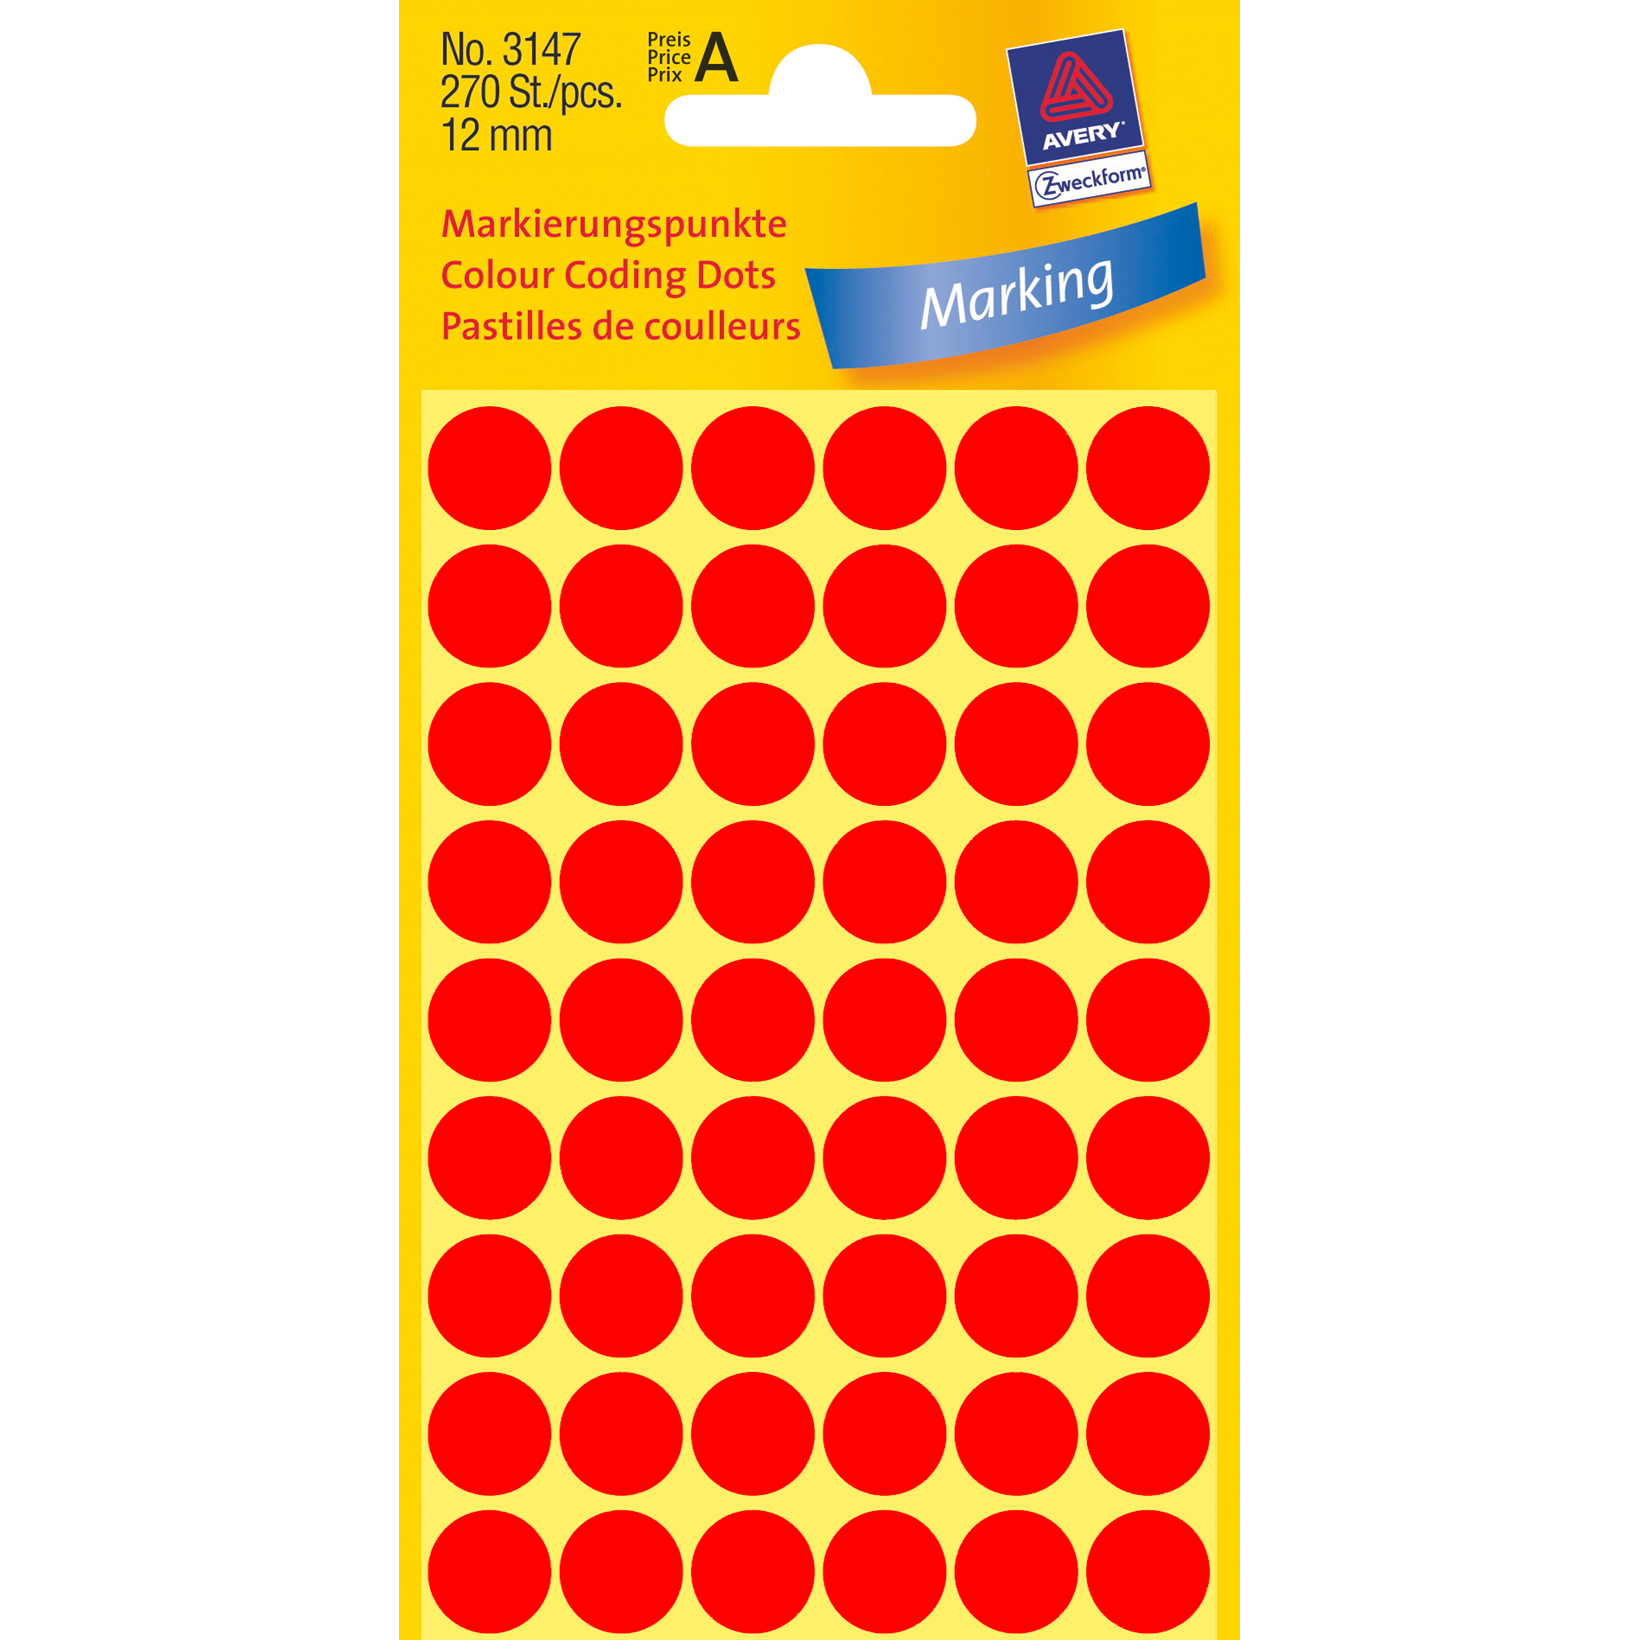 Avery 3147  - Runde Etiketter neon rød Ø: 12 mm - 270 stk